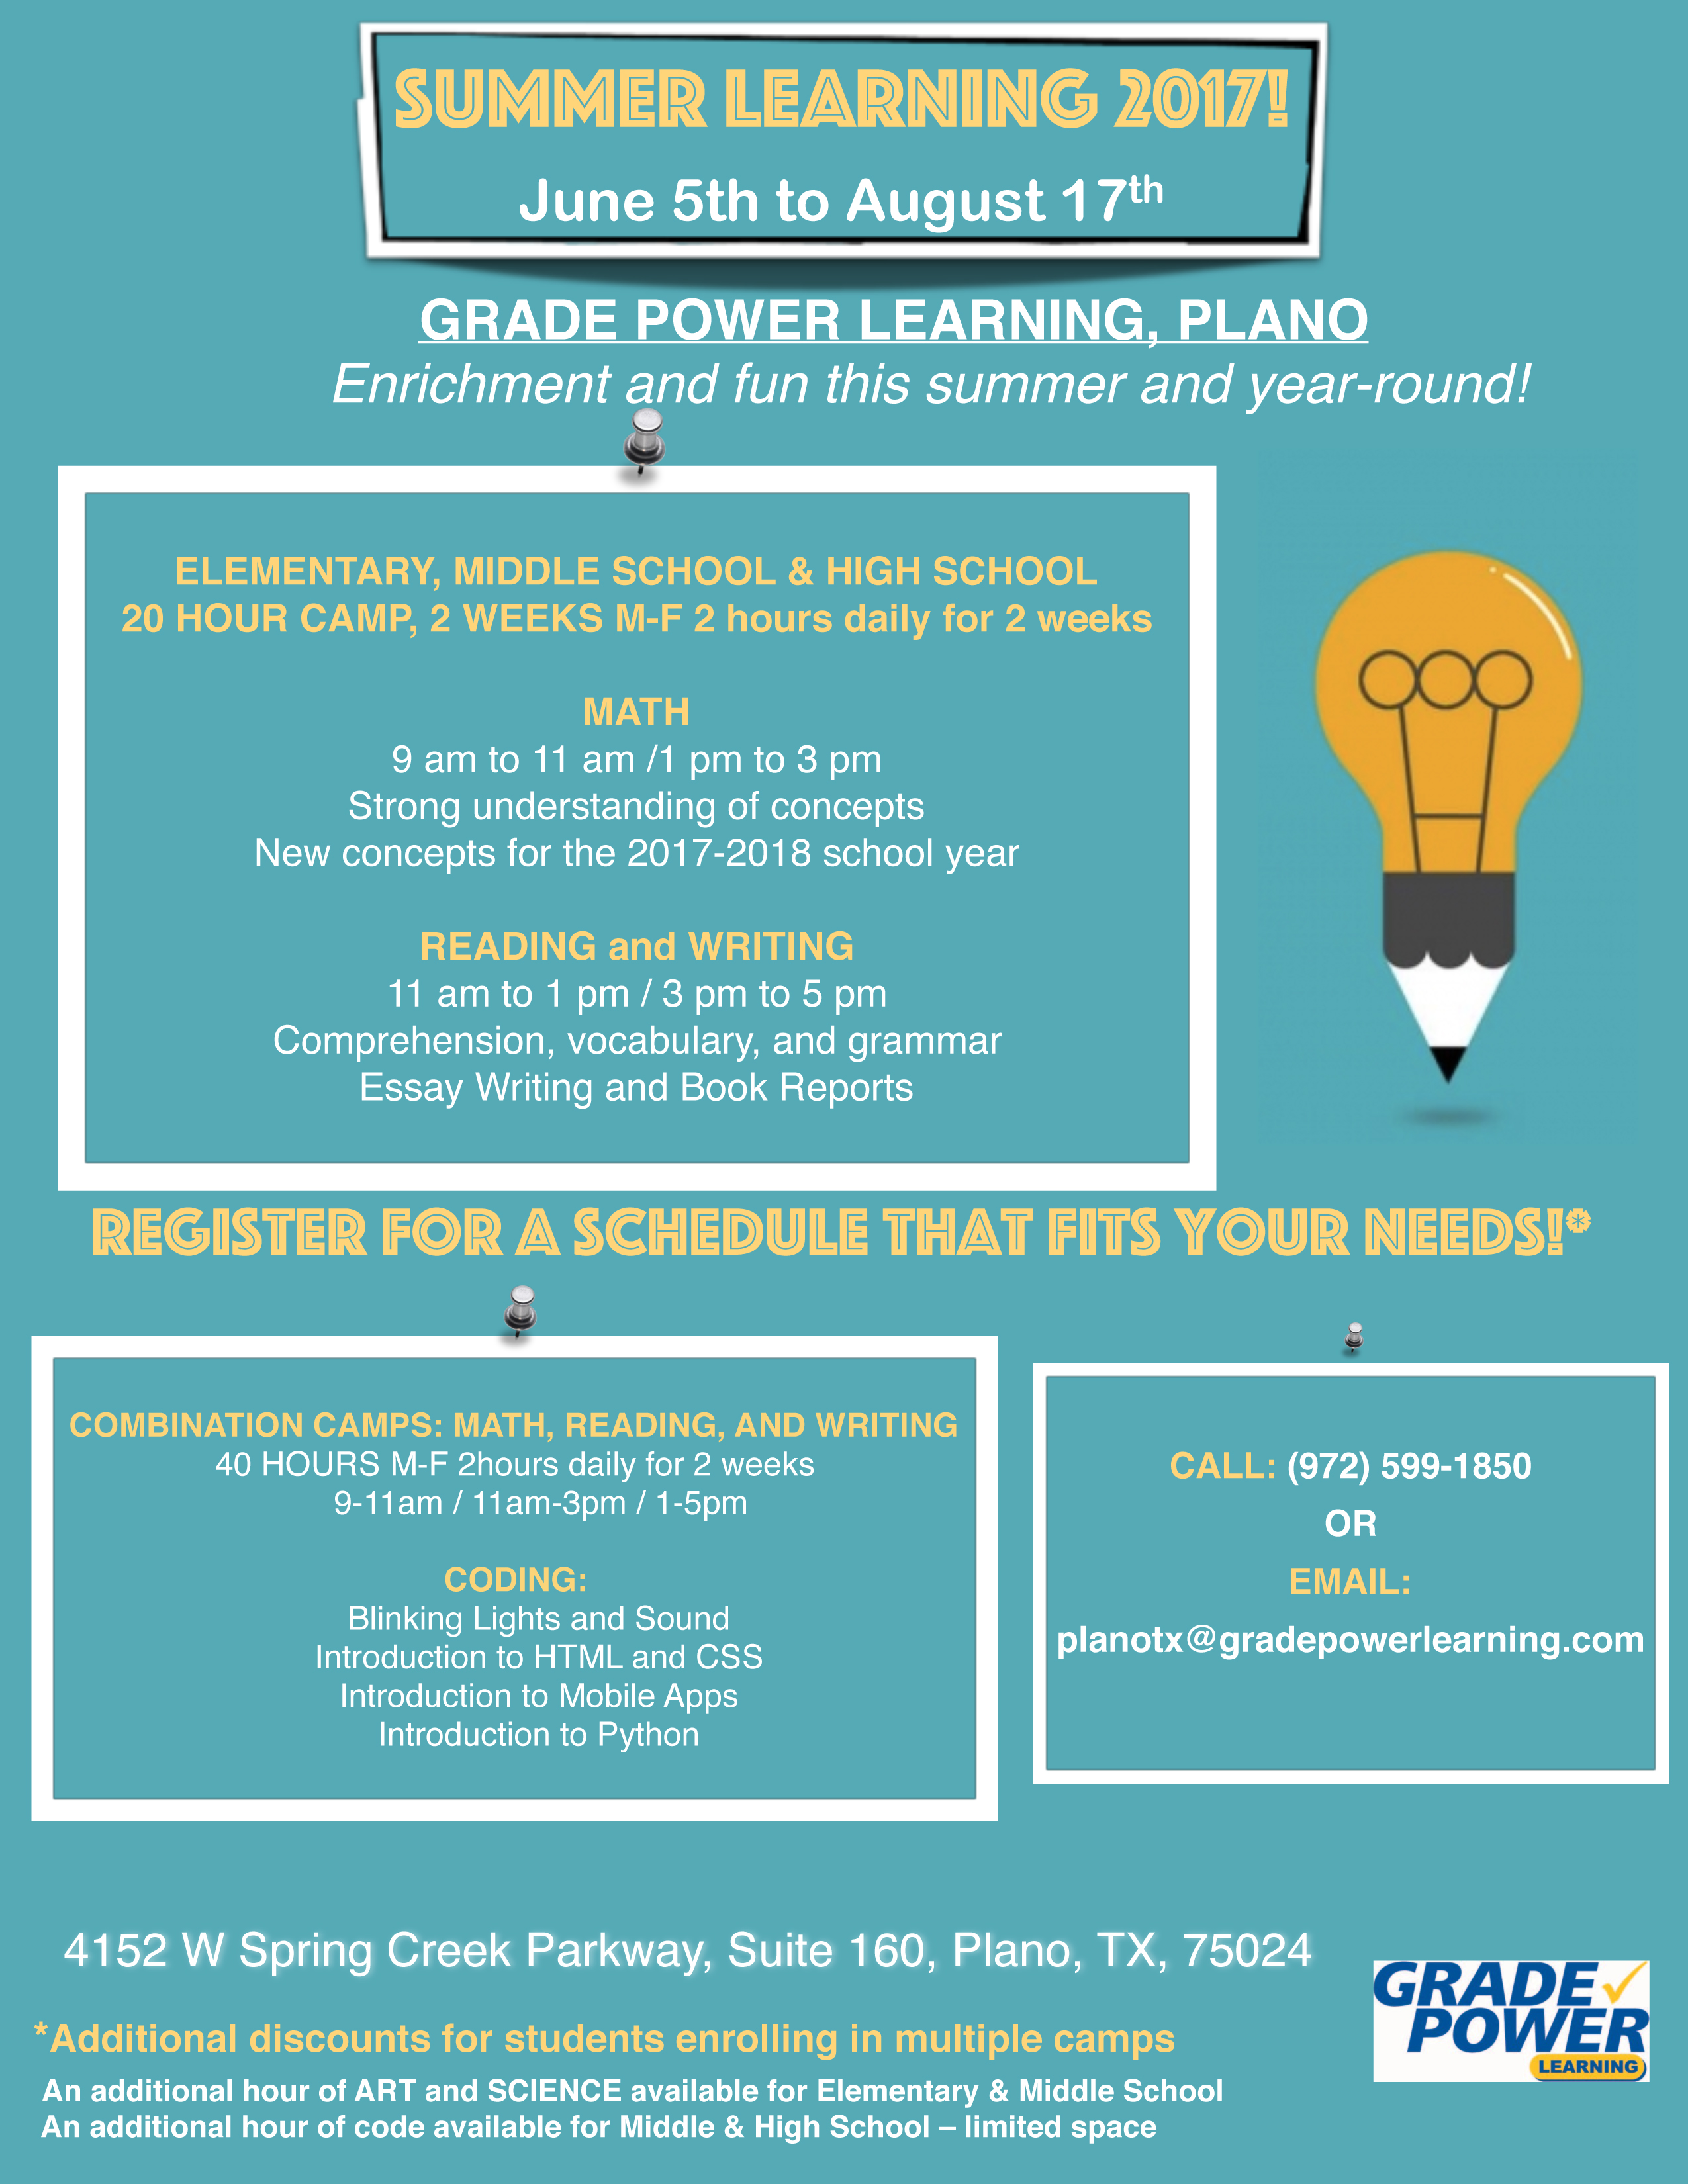 GradePower Learning - Tutoring Center in Plano, TX, Austin, TX ...